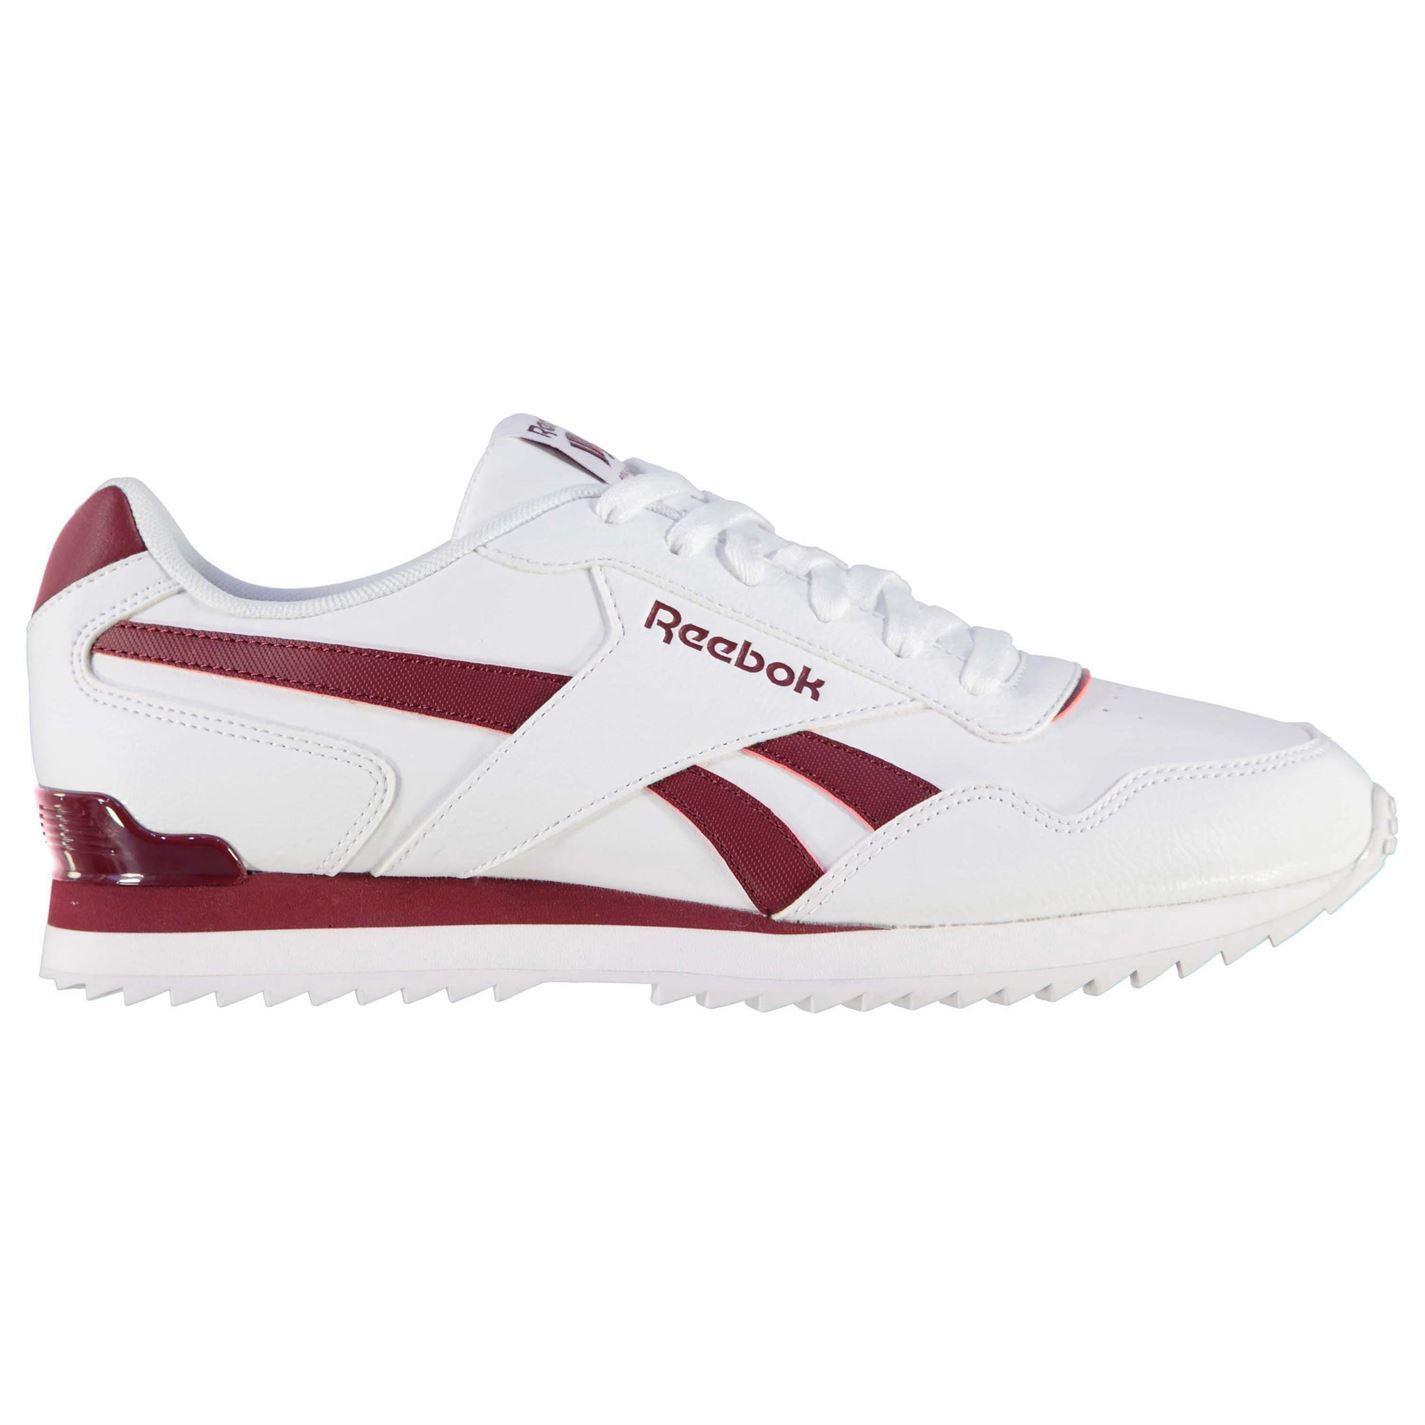 Reebok Hombre Royal Glide Ripple Clip Zapatillas Zapatos Calzado Deporte